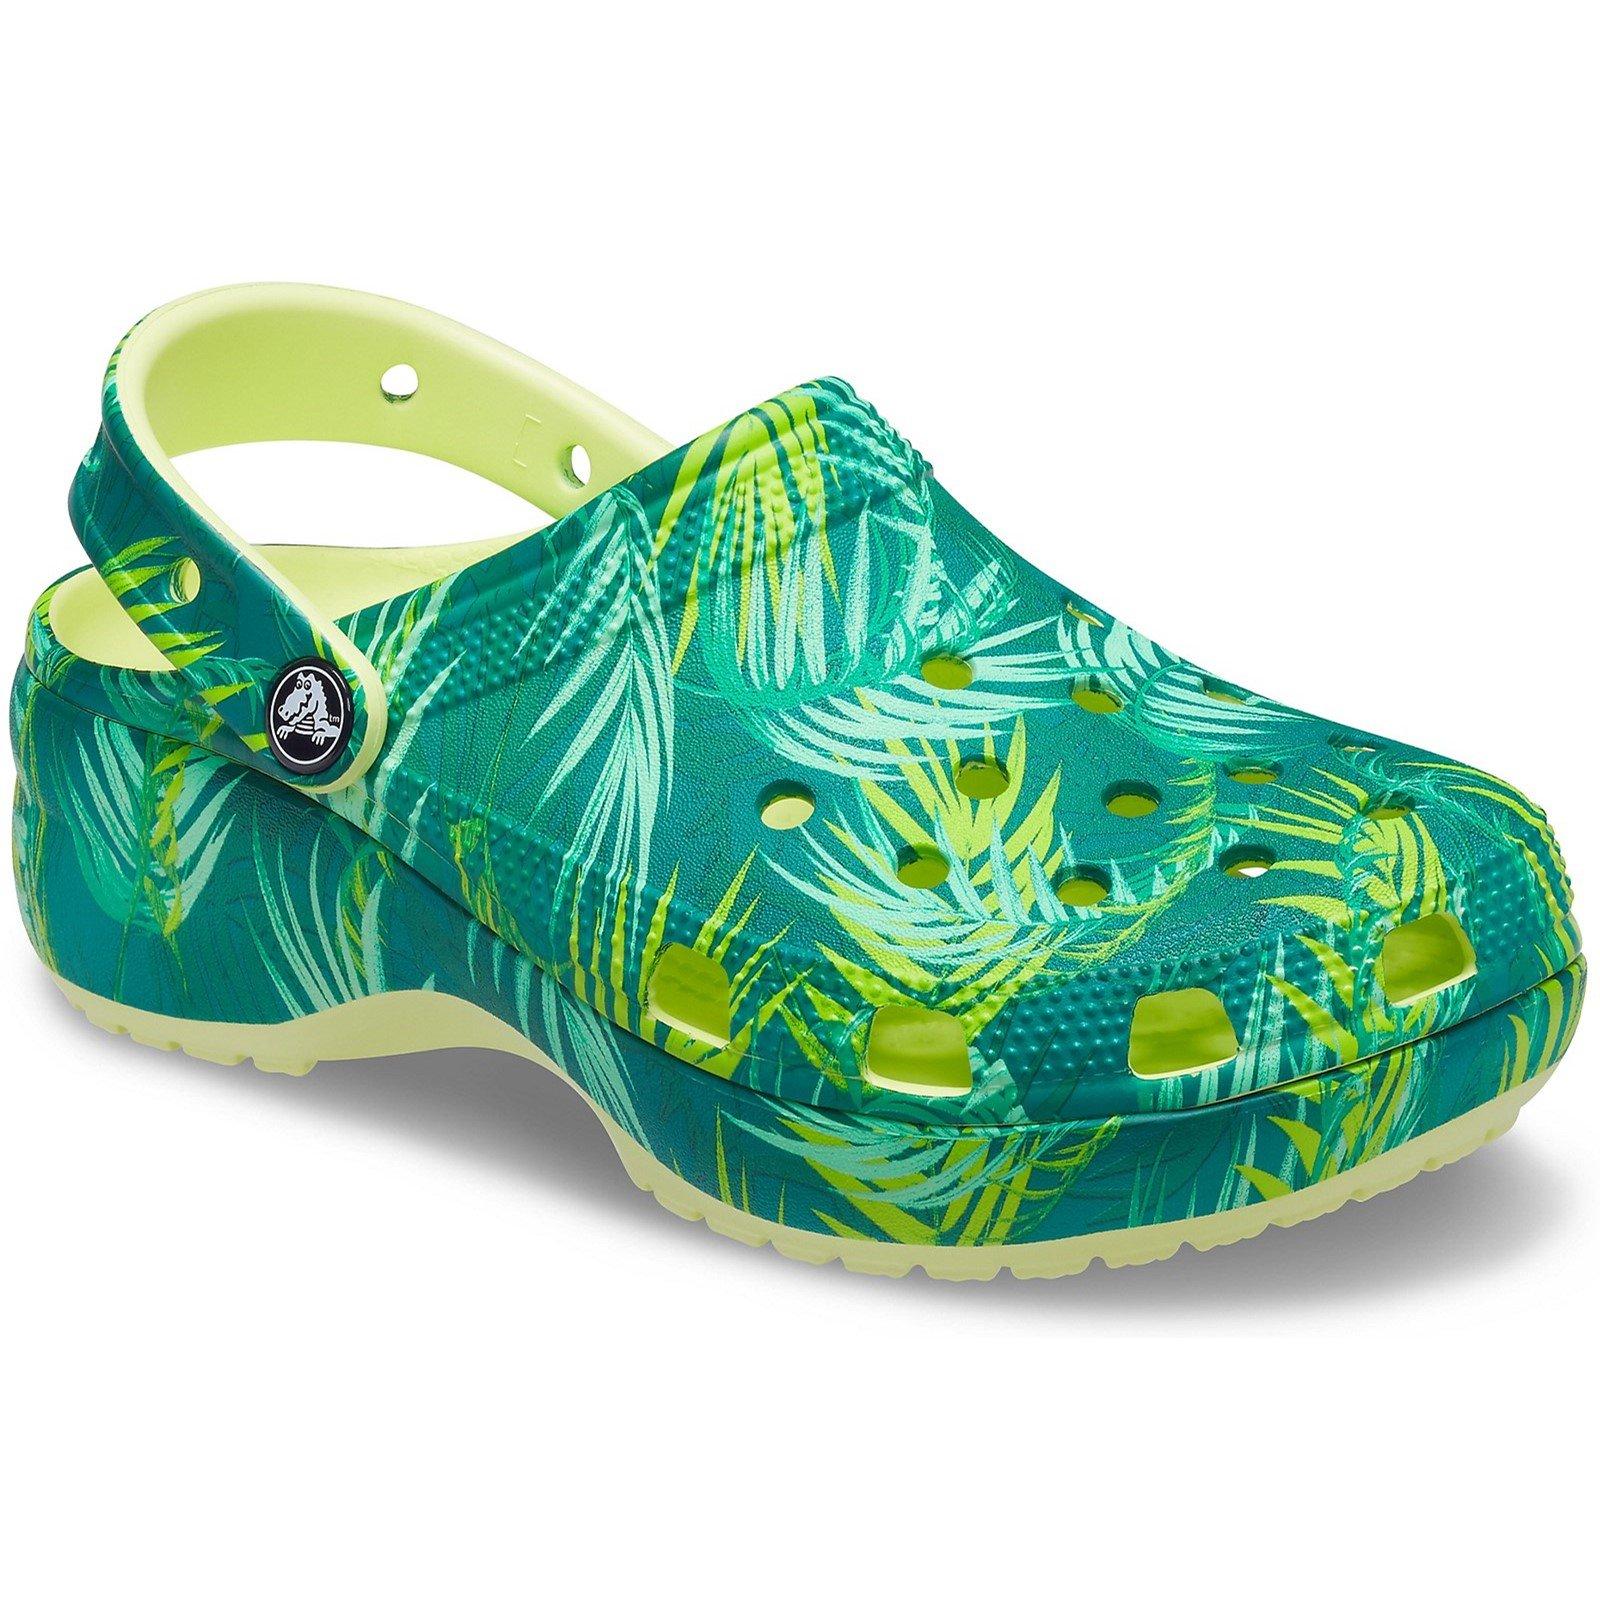 Crocs Women's Platform Tropical Beach Clog Multicolor 32723-55891 - Multi 3